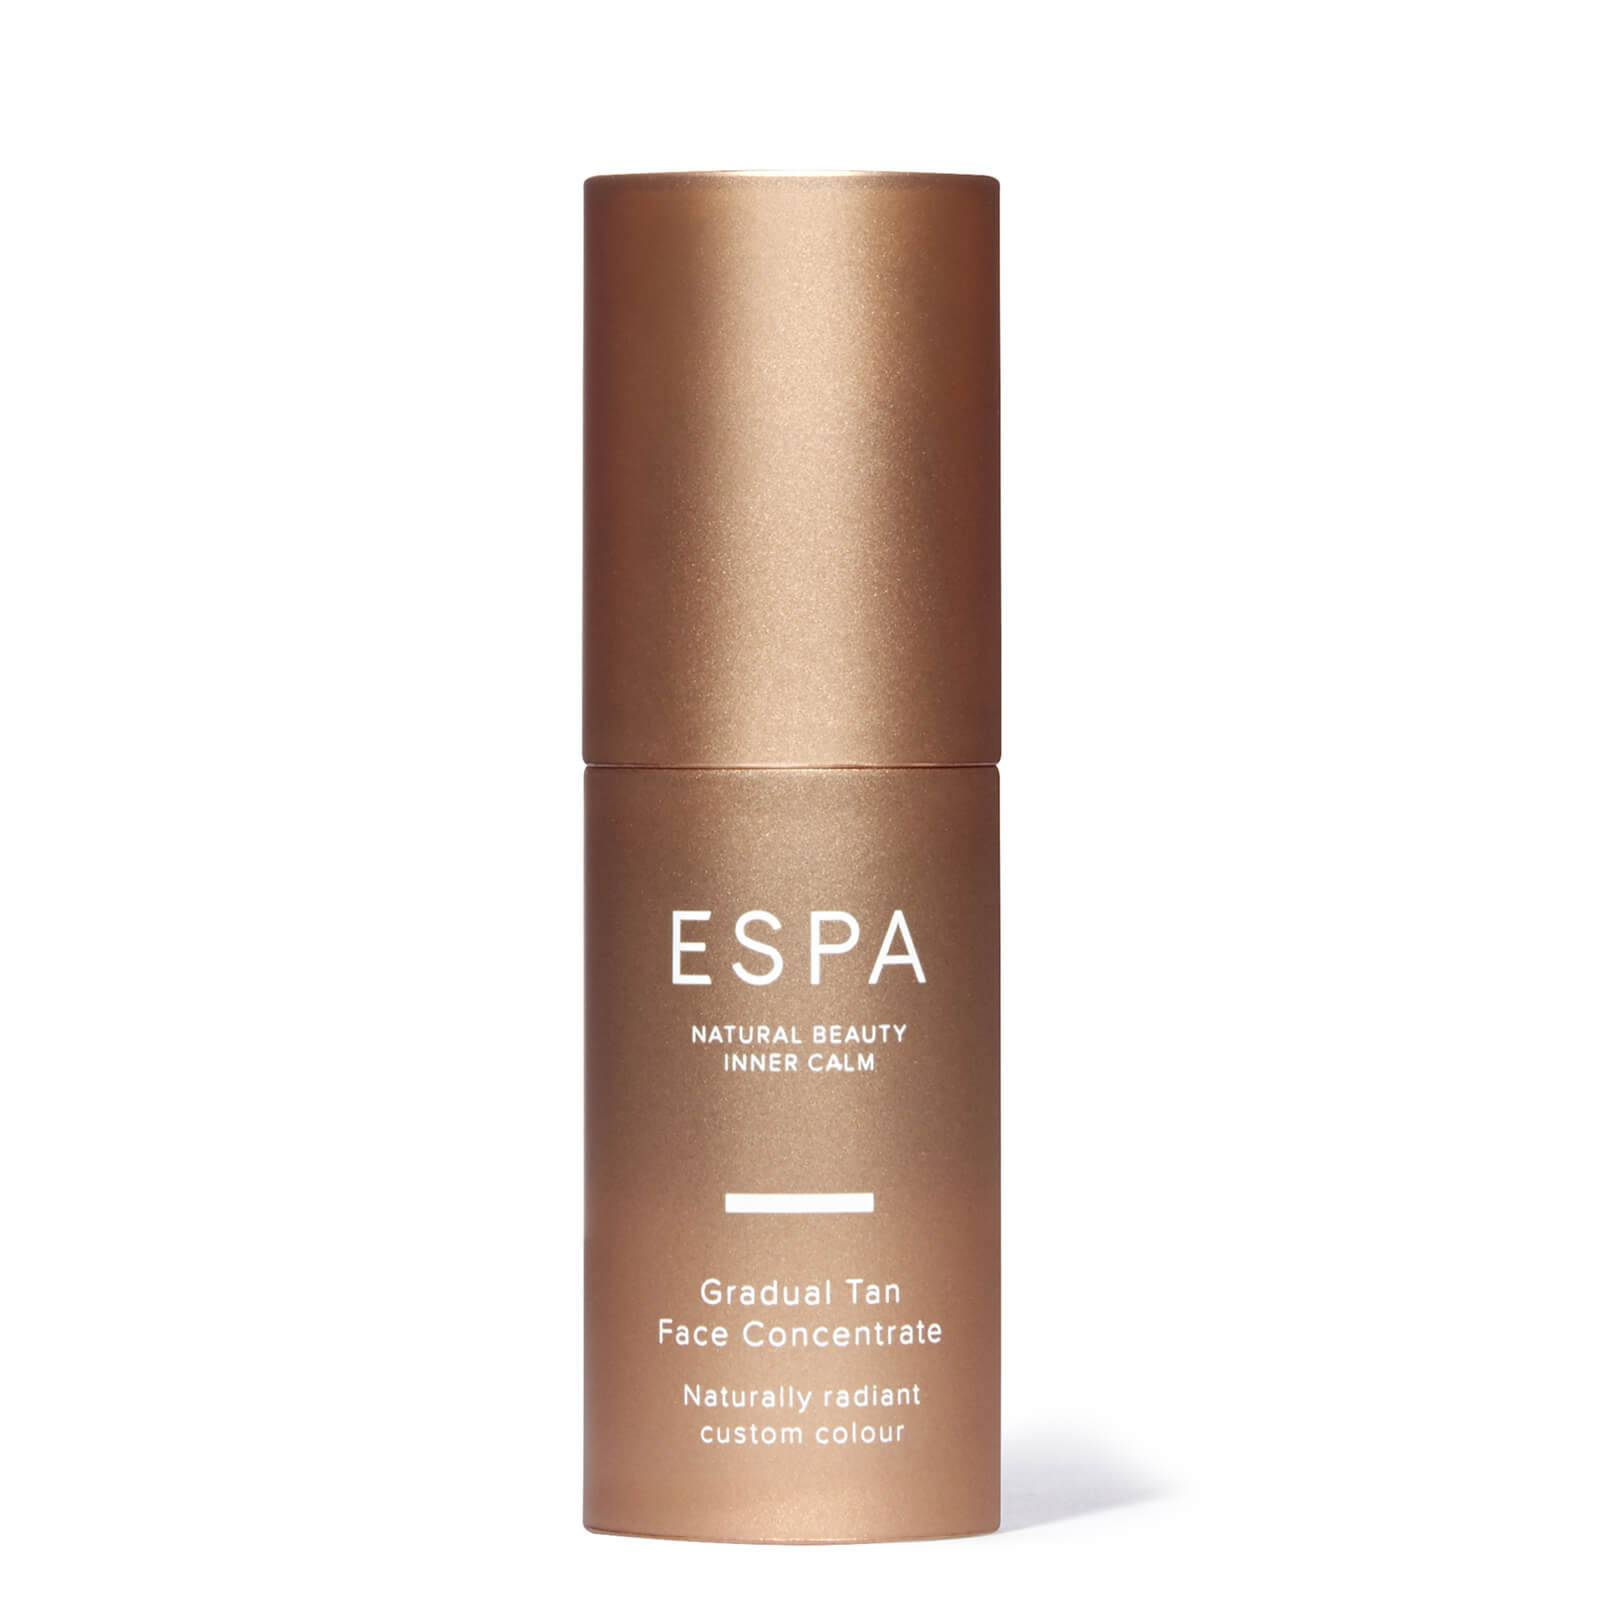 ESPA Gradual Tan Face Concentrate 15ml